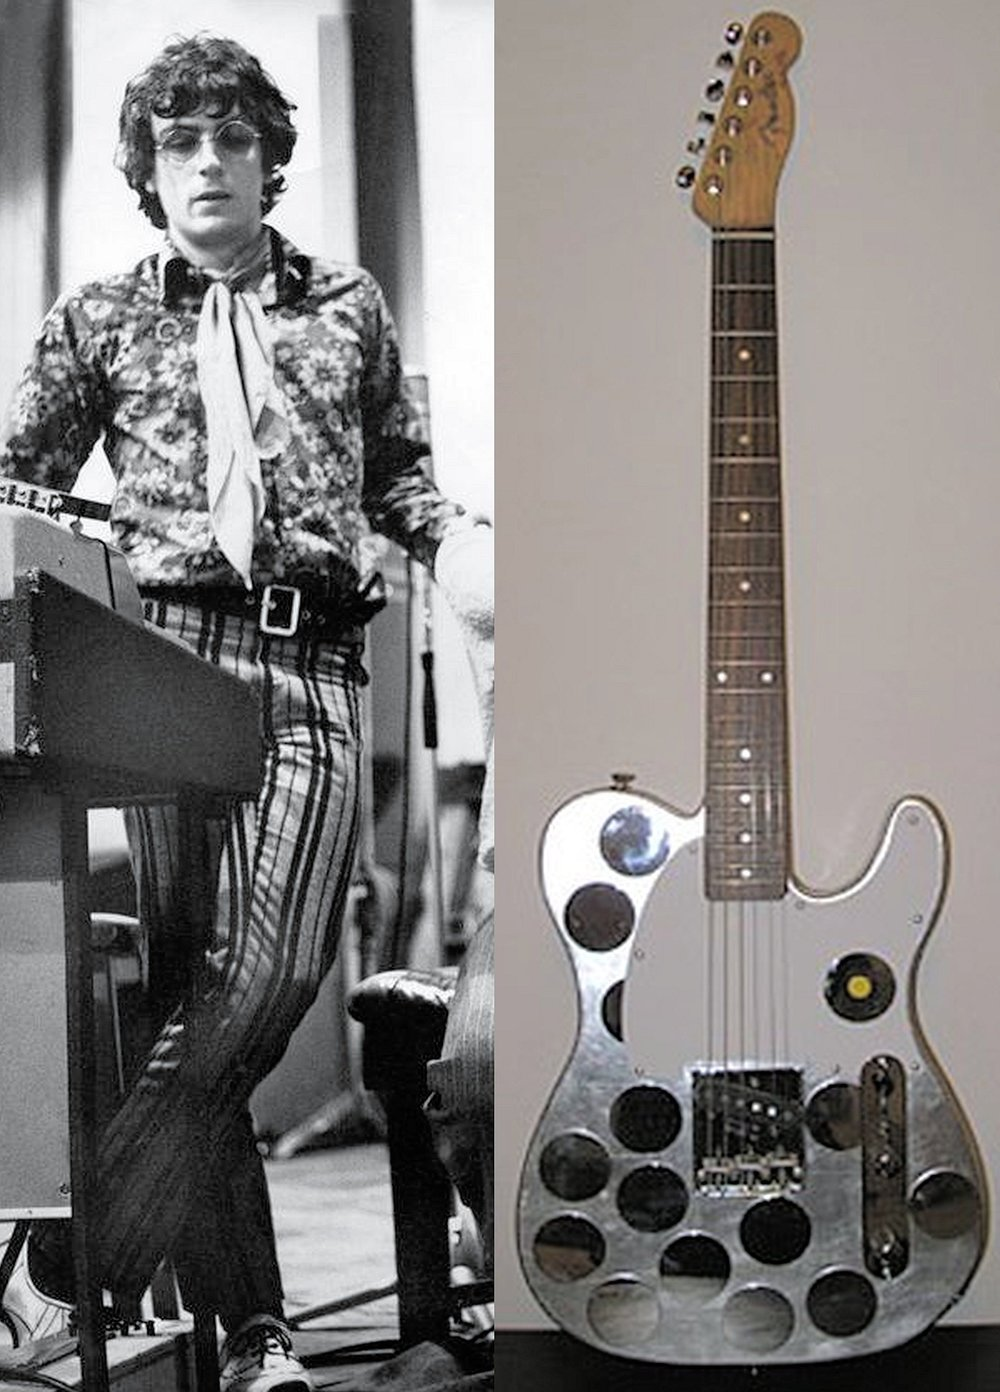 Syd Barrett and his favourite silver Fender